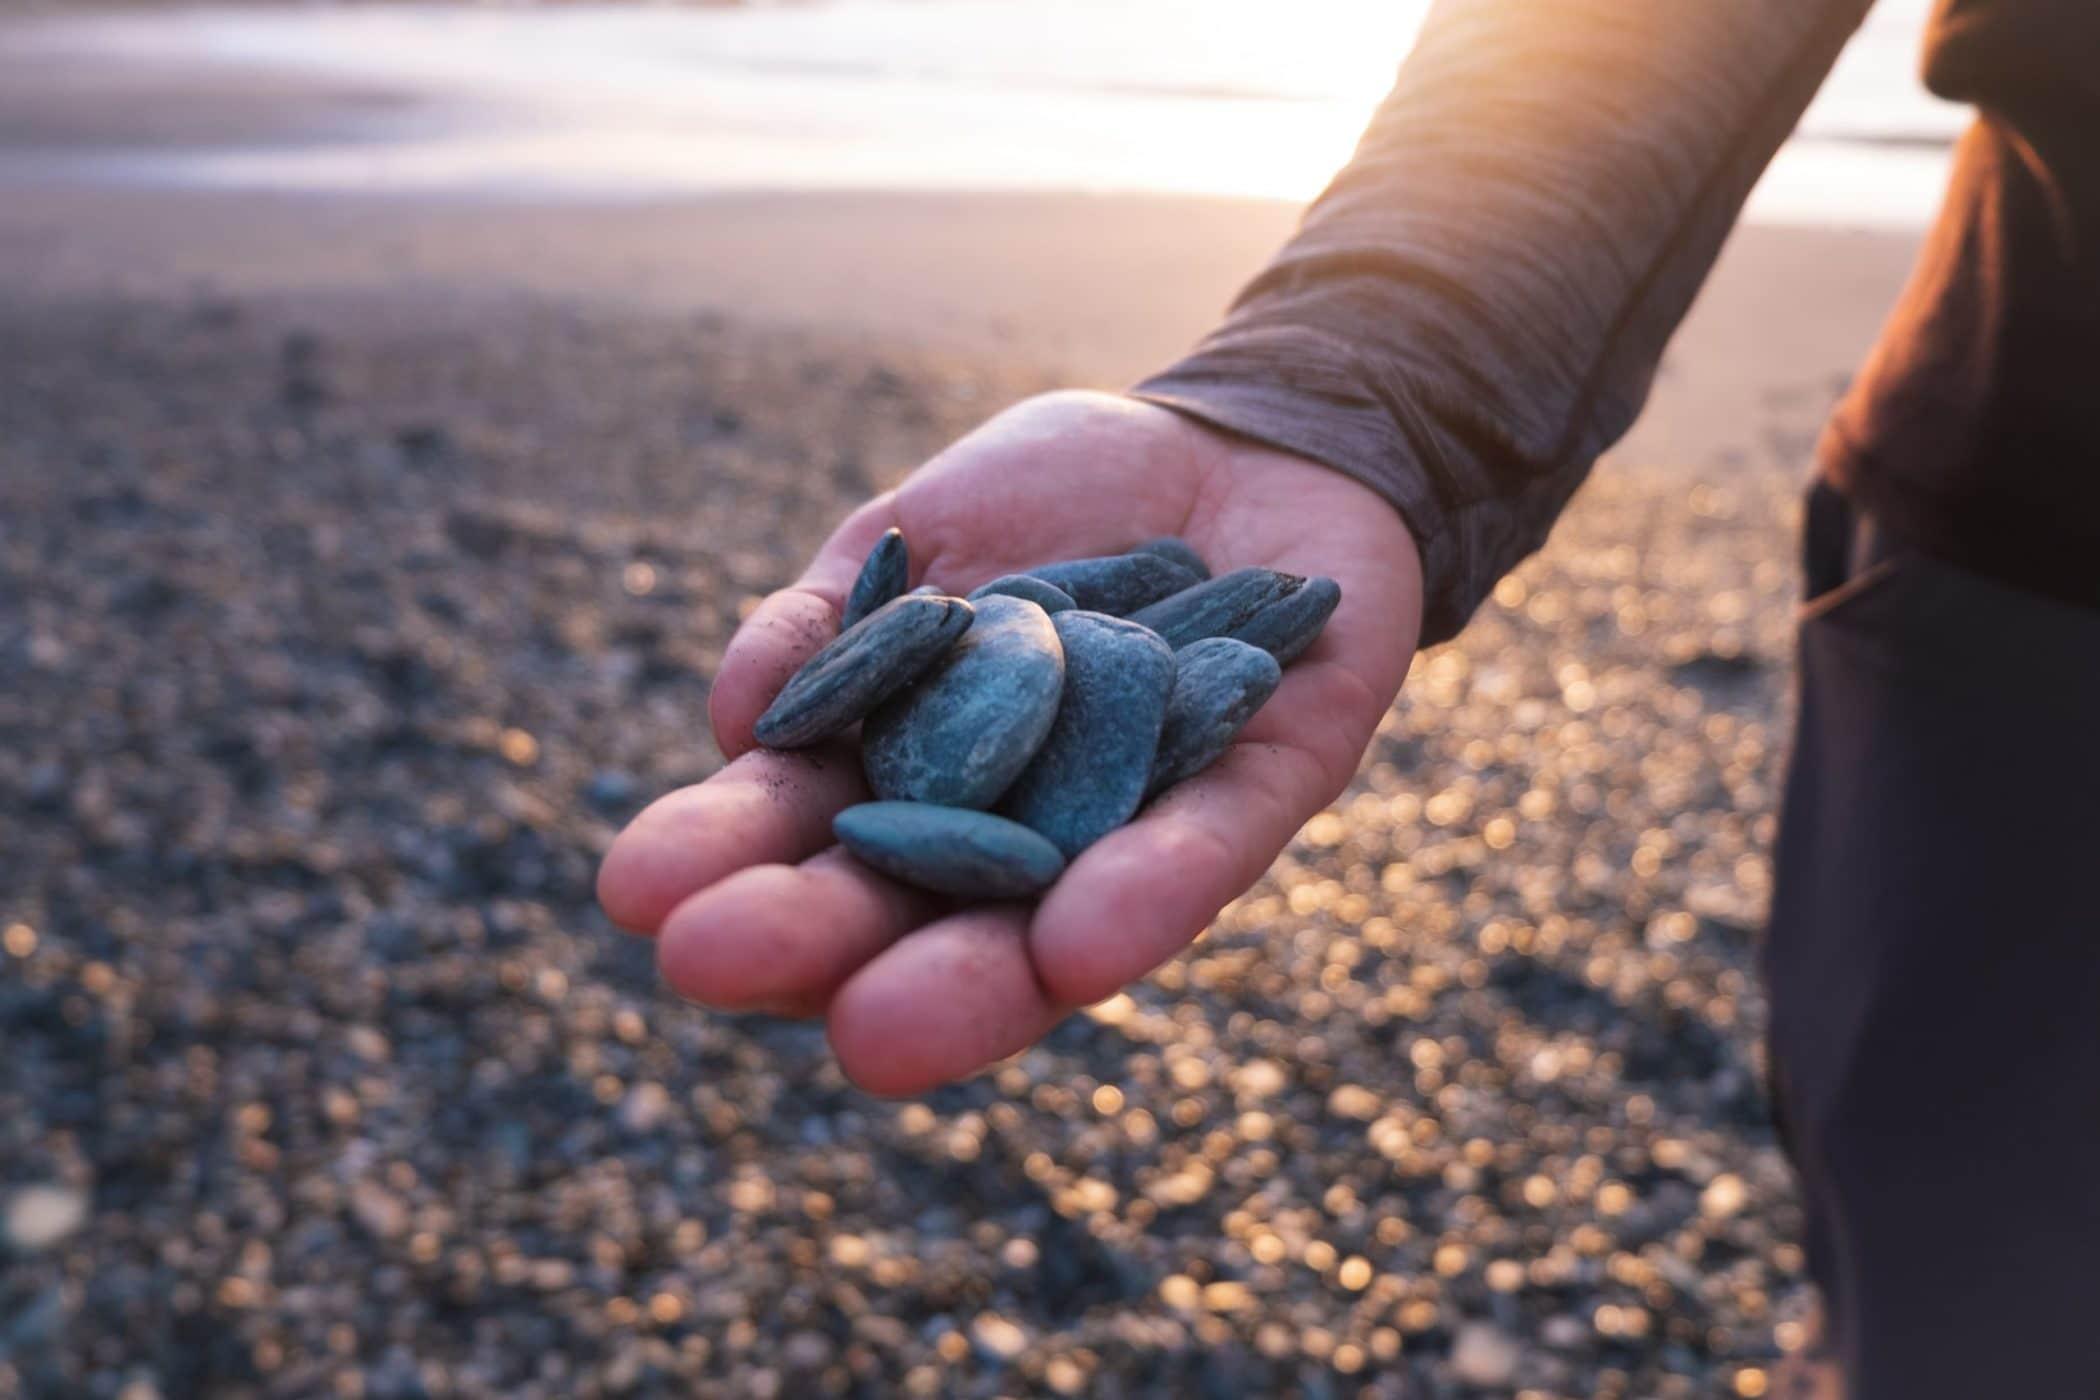 Finding greenstone on the beach in Hokitika, New Zealand